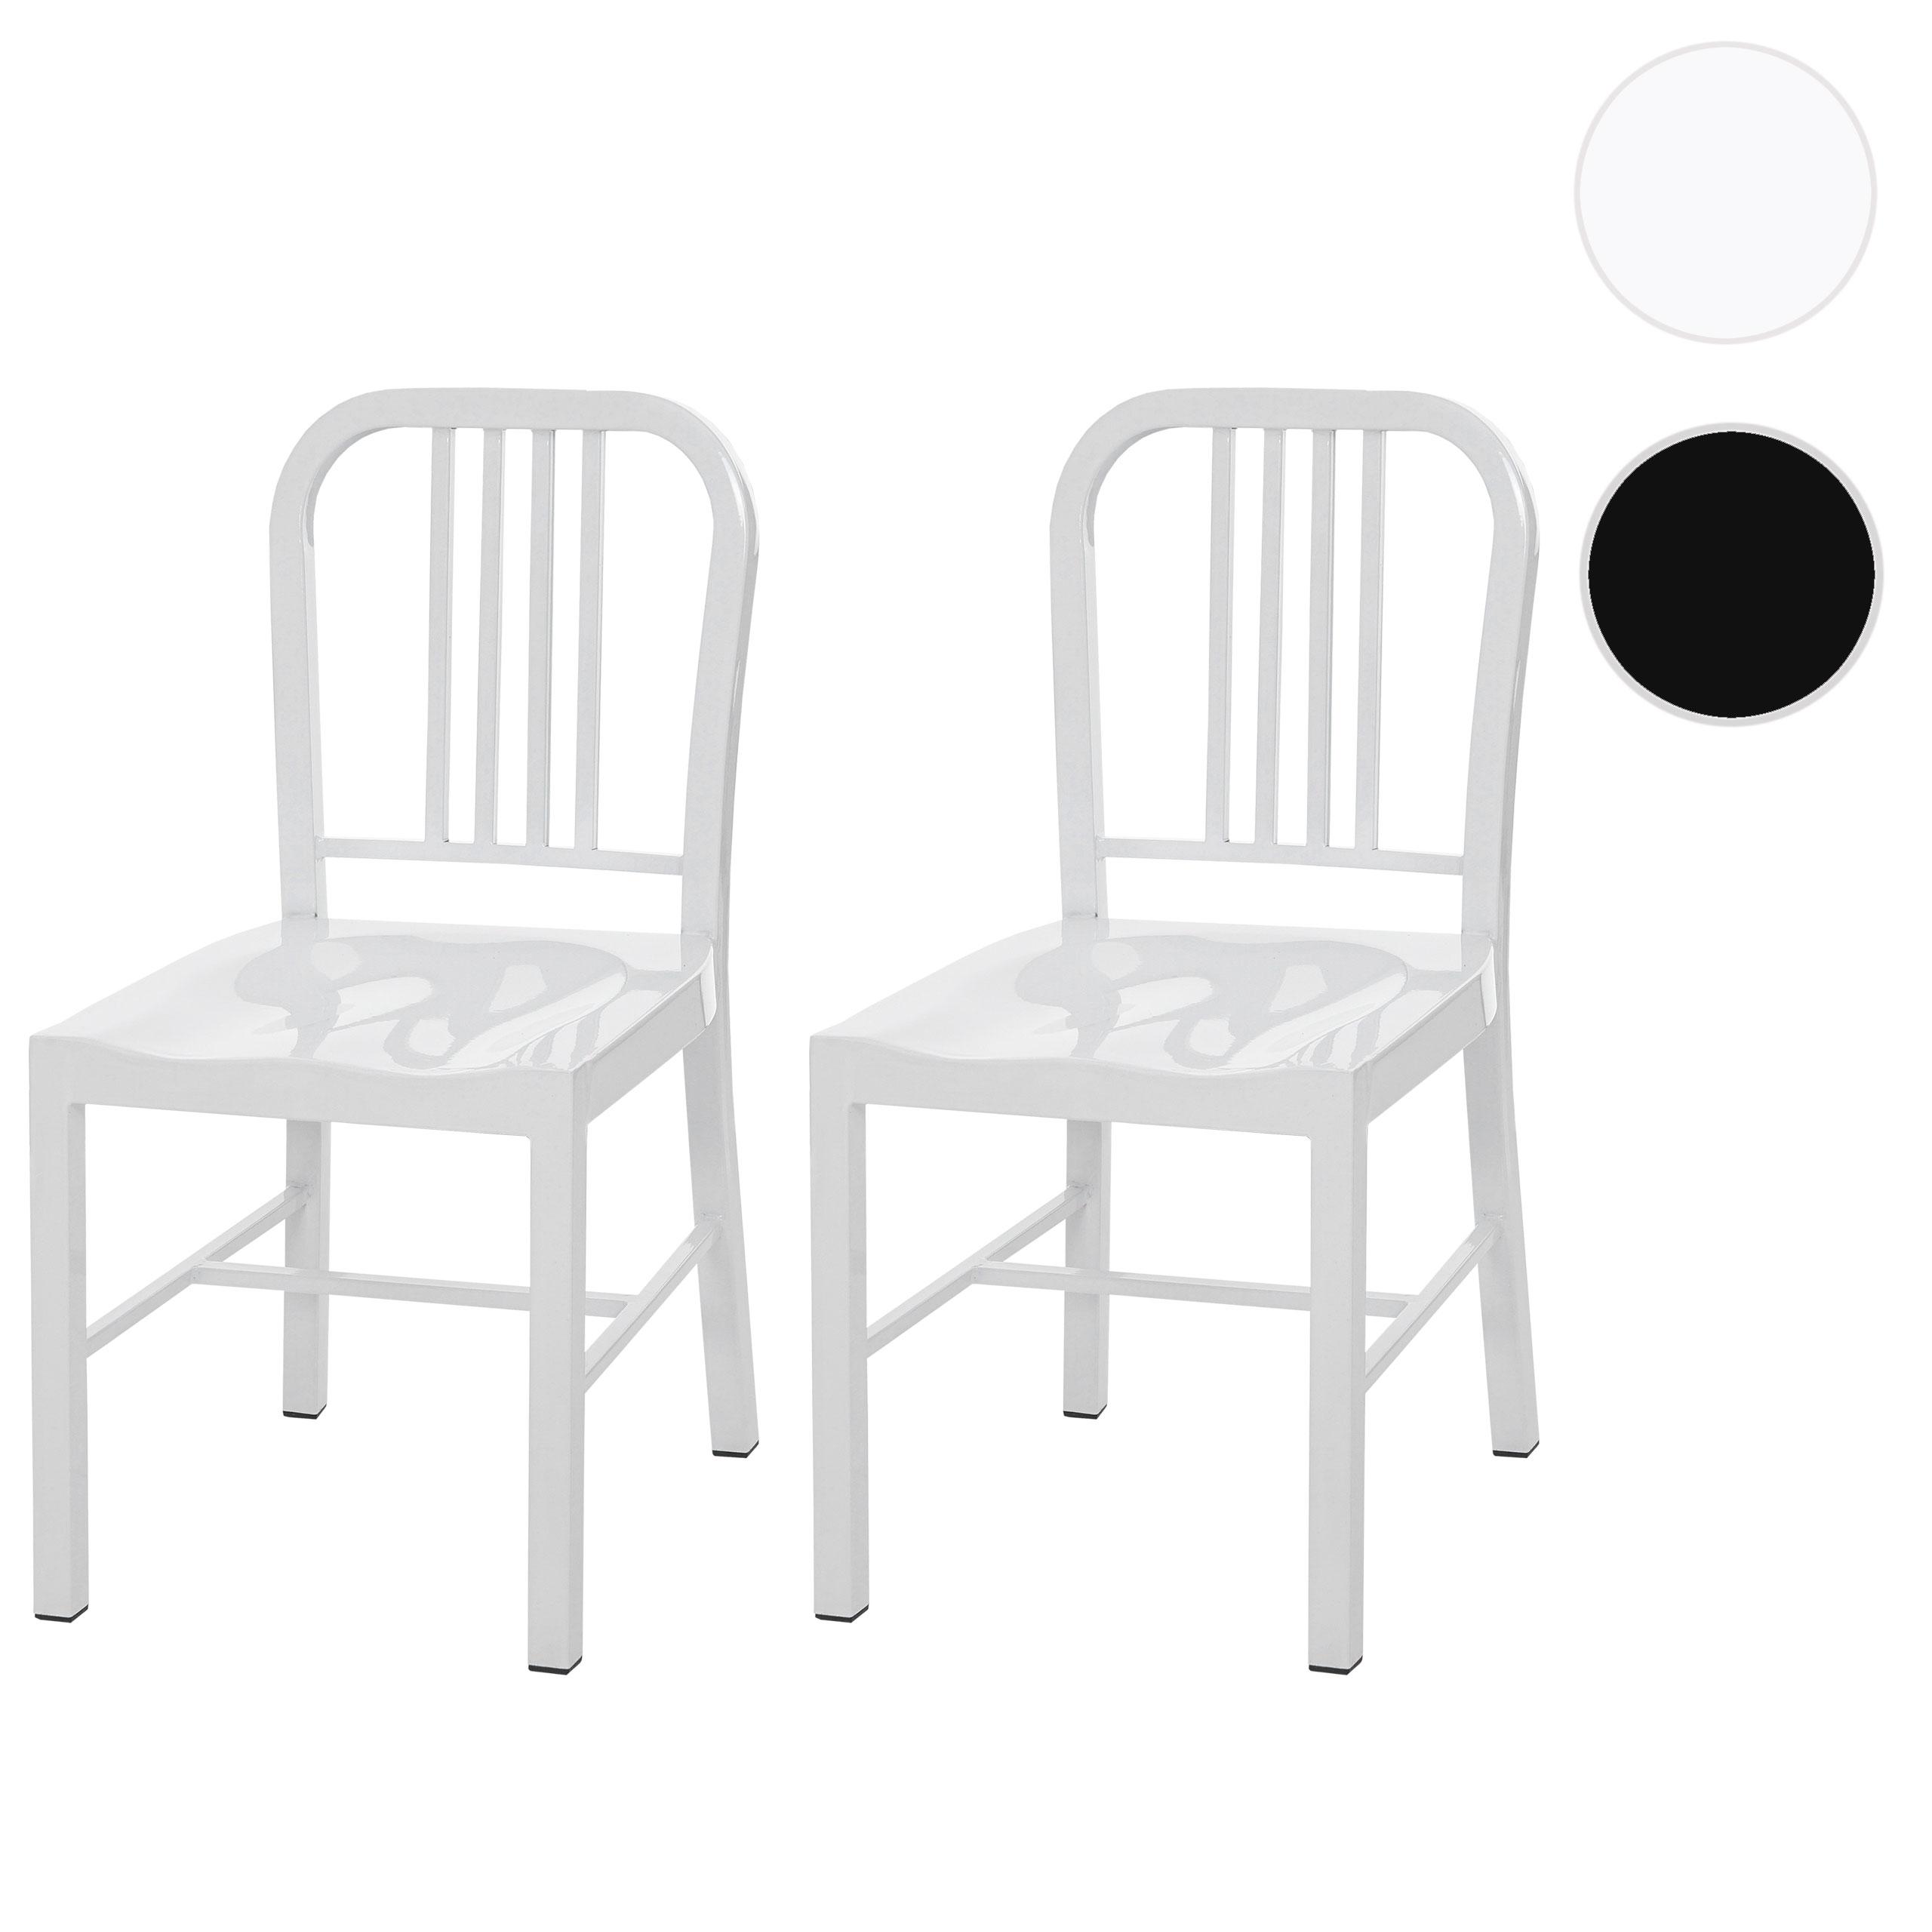 2x Esszimmerstuhl Hwc A73 Stuhl Kuchenstuhl Metall